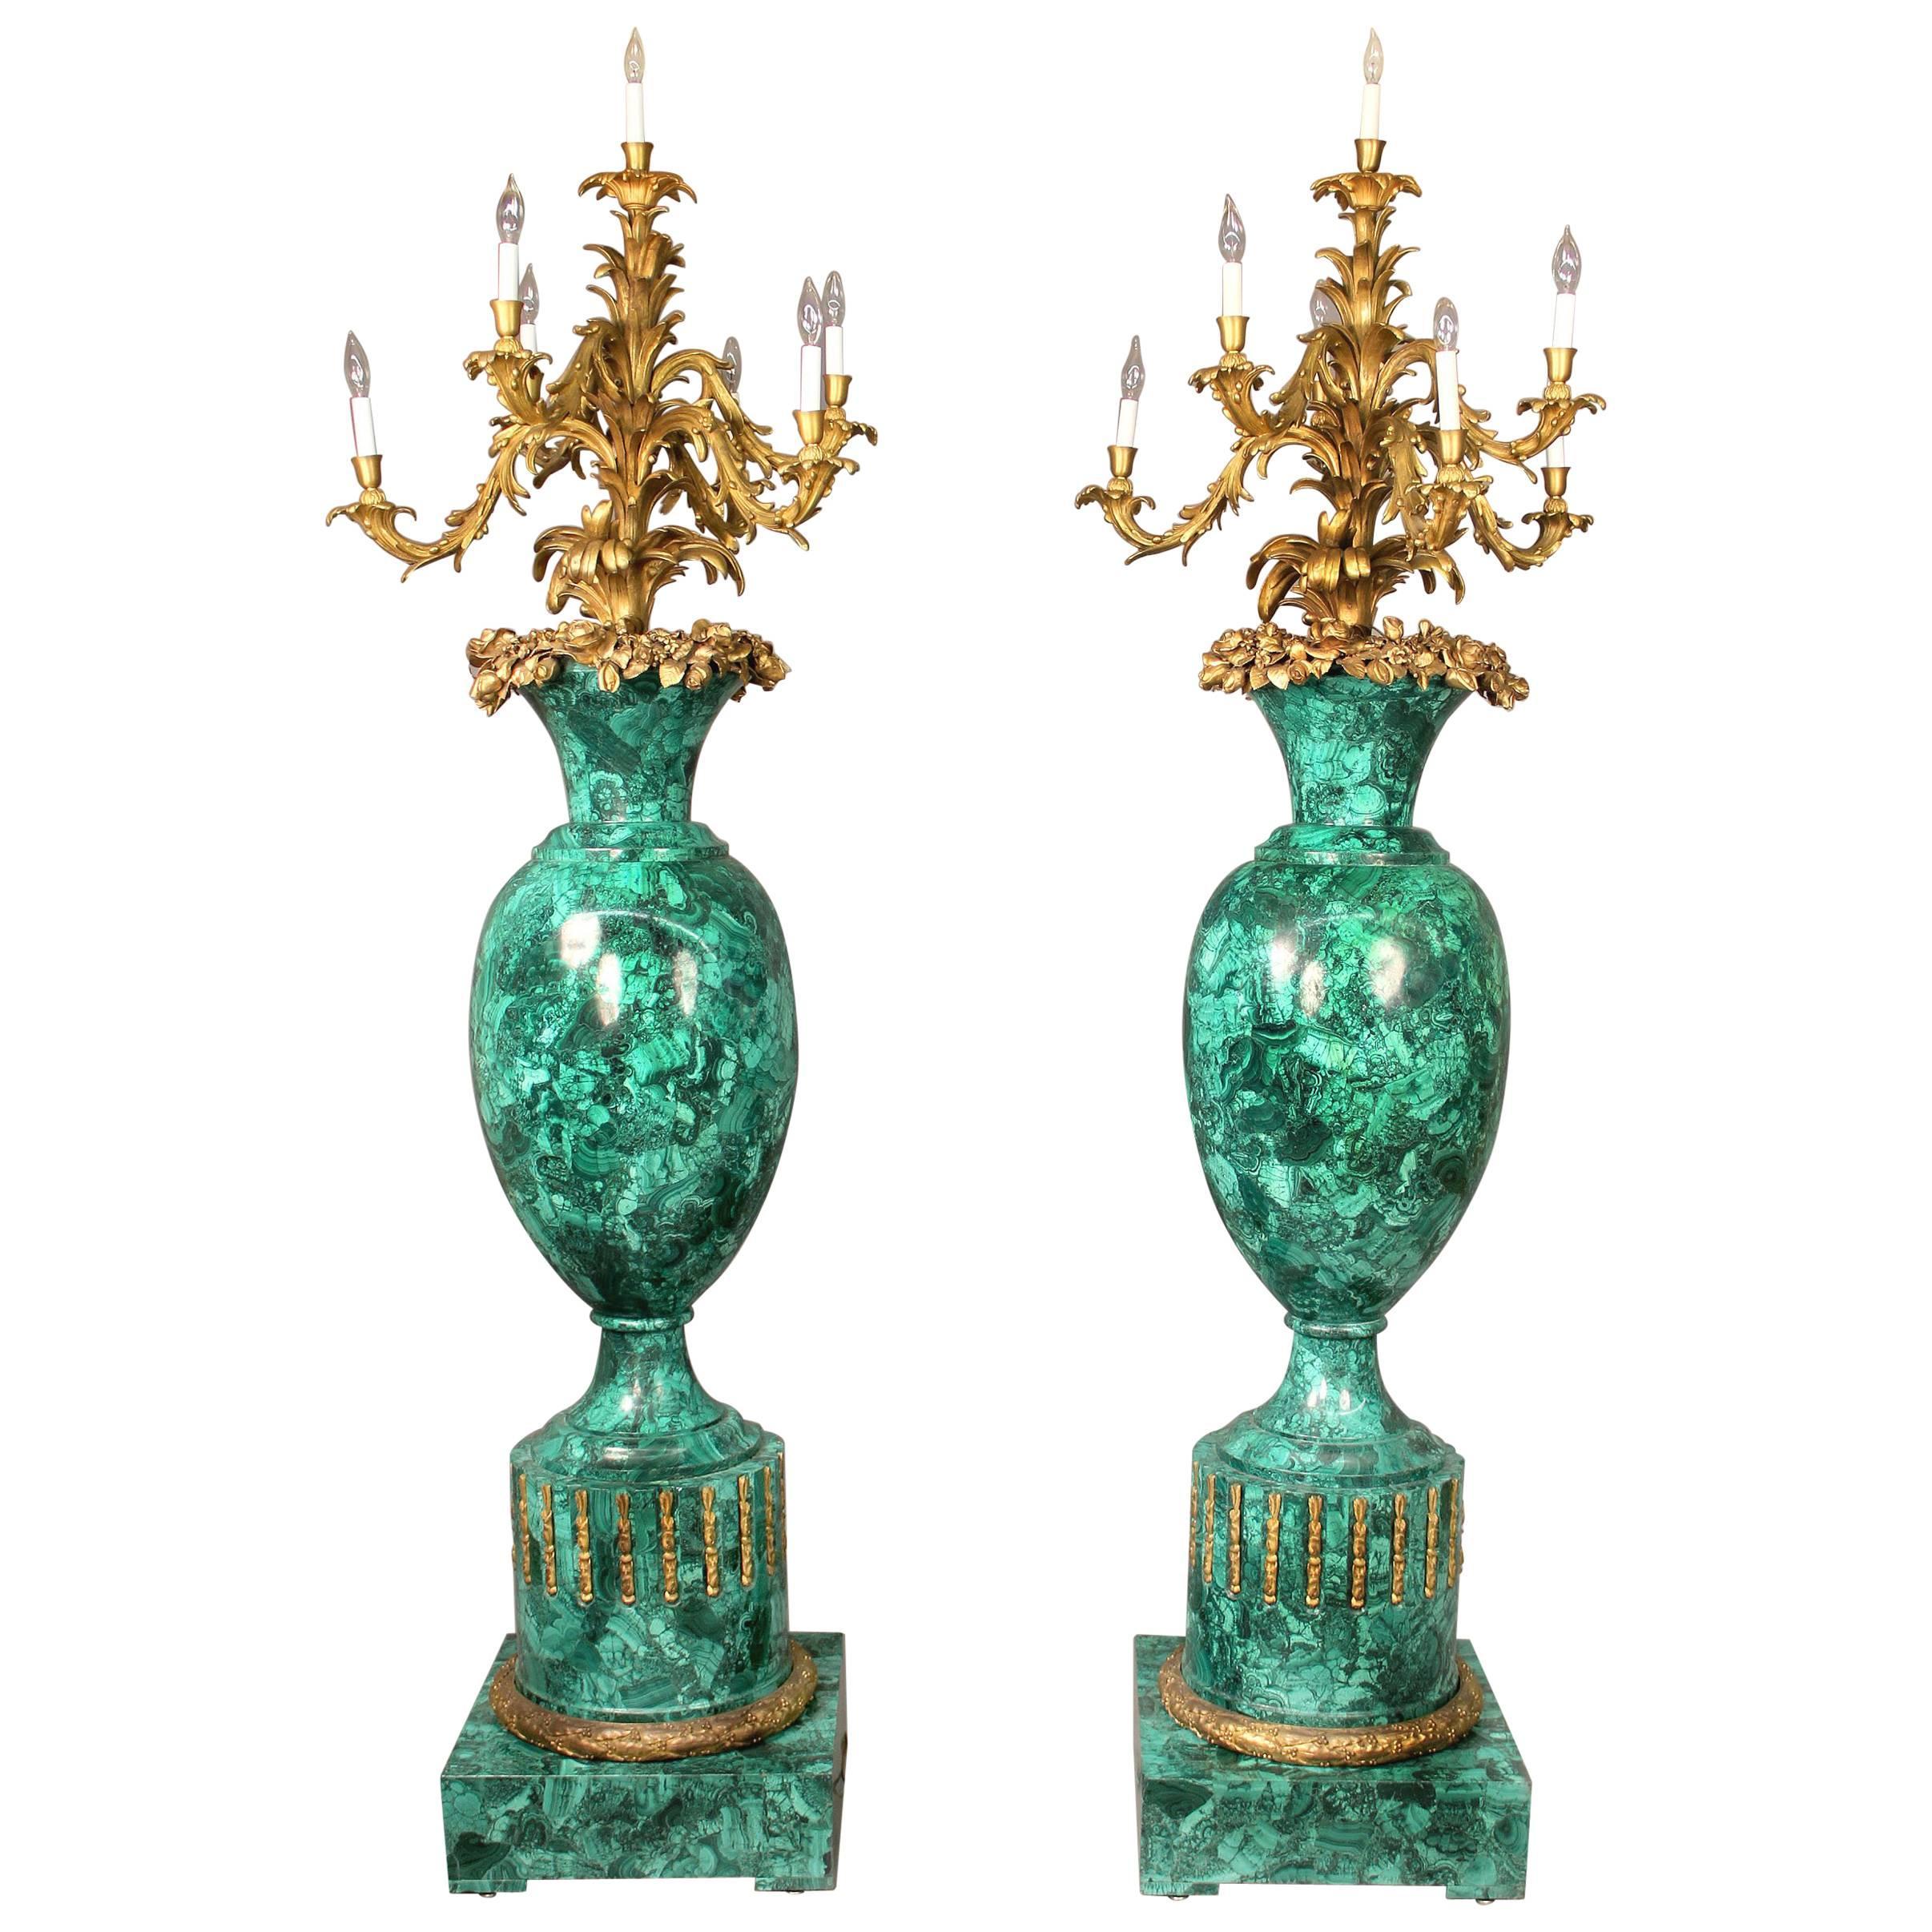 Rare and Palatial Pair of Gilt Bronze and Malachite Seven Light Torcheres